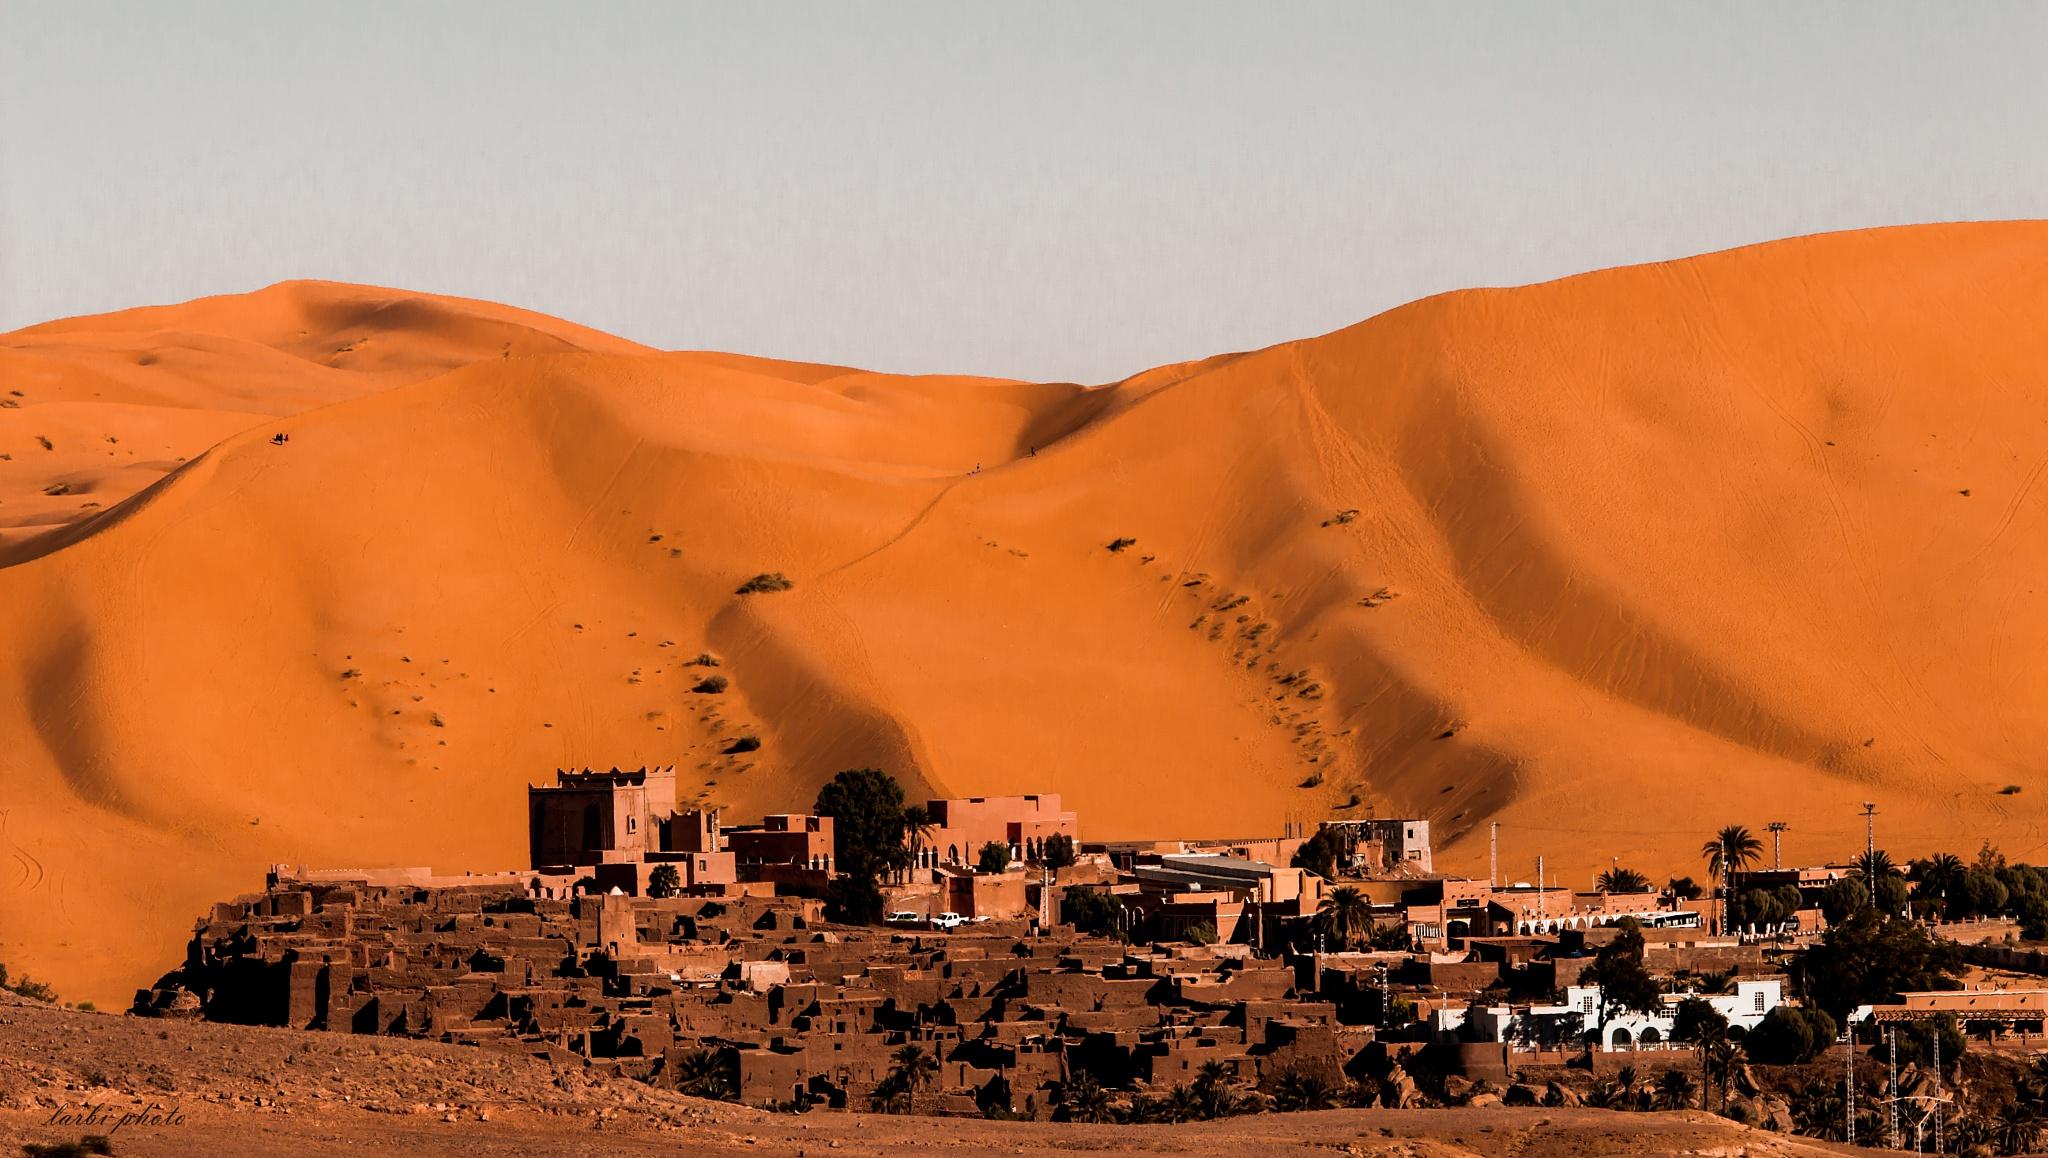 taghit of algeria by LarbiMazouzi